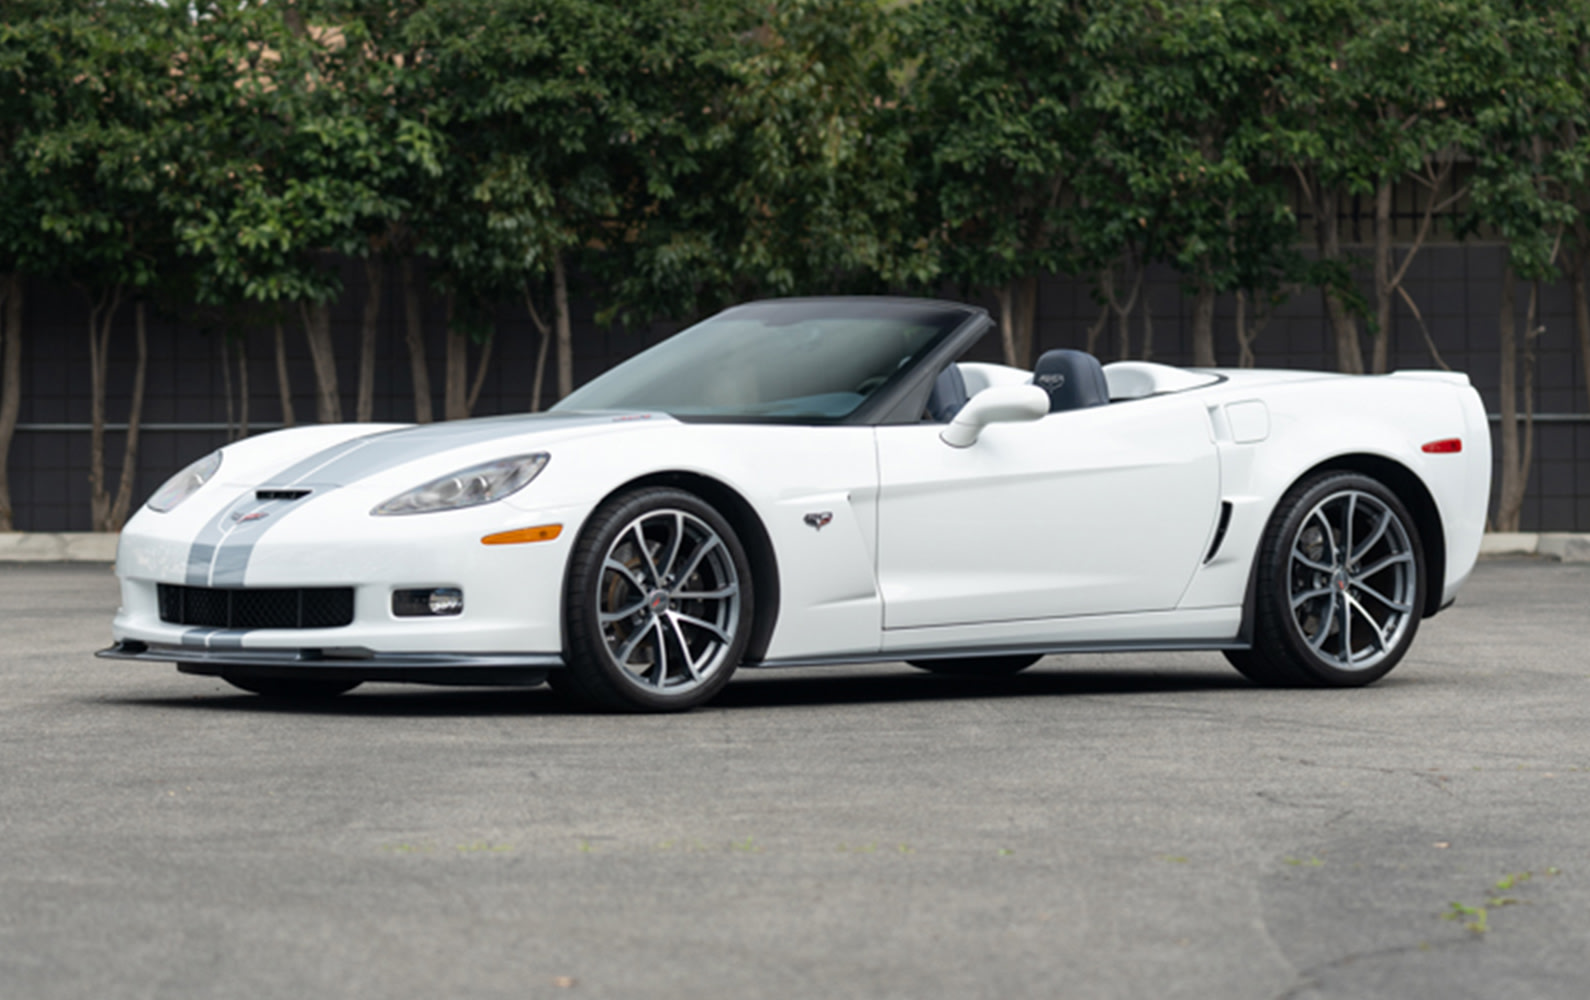 Prod/O21F - May 2021/1487_2013 Chevrolet Corvette 427 60th Anniversary Convertible/2013_Chevrolet_Corvette_427_60th_Anniversary_Convertible_12_kfgfoa